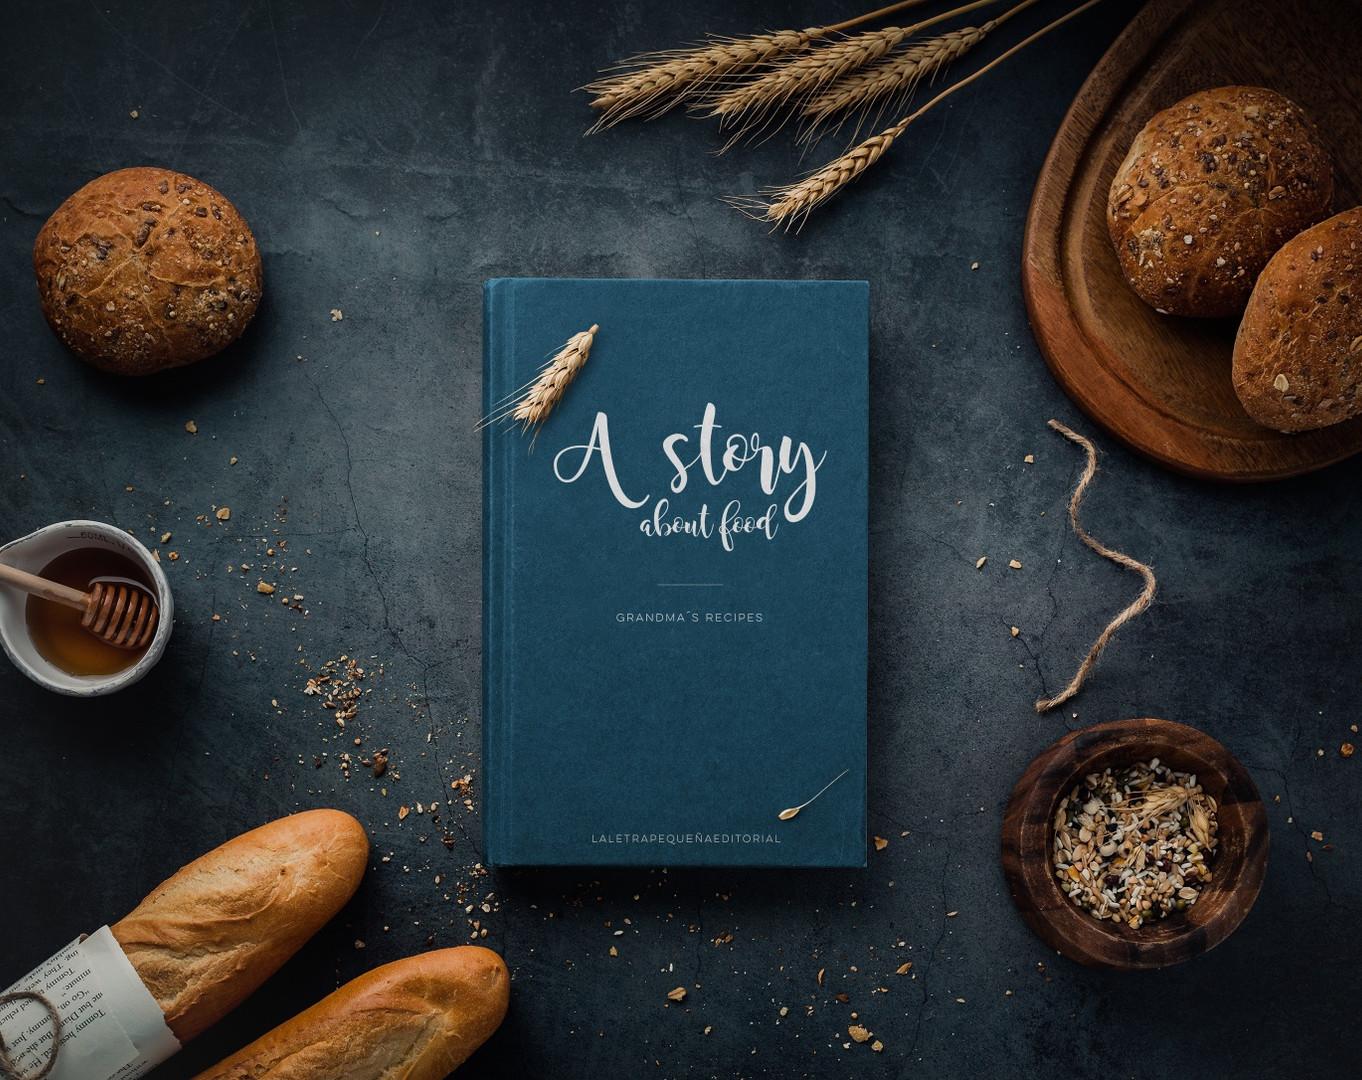 2. A story about food.jpeg